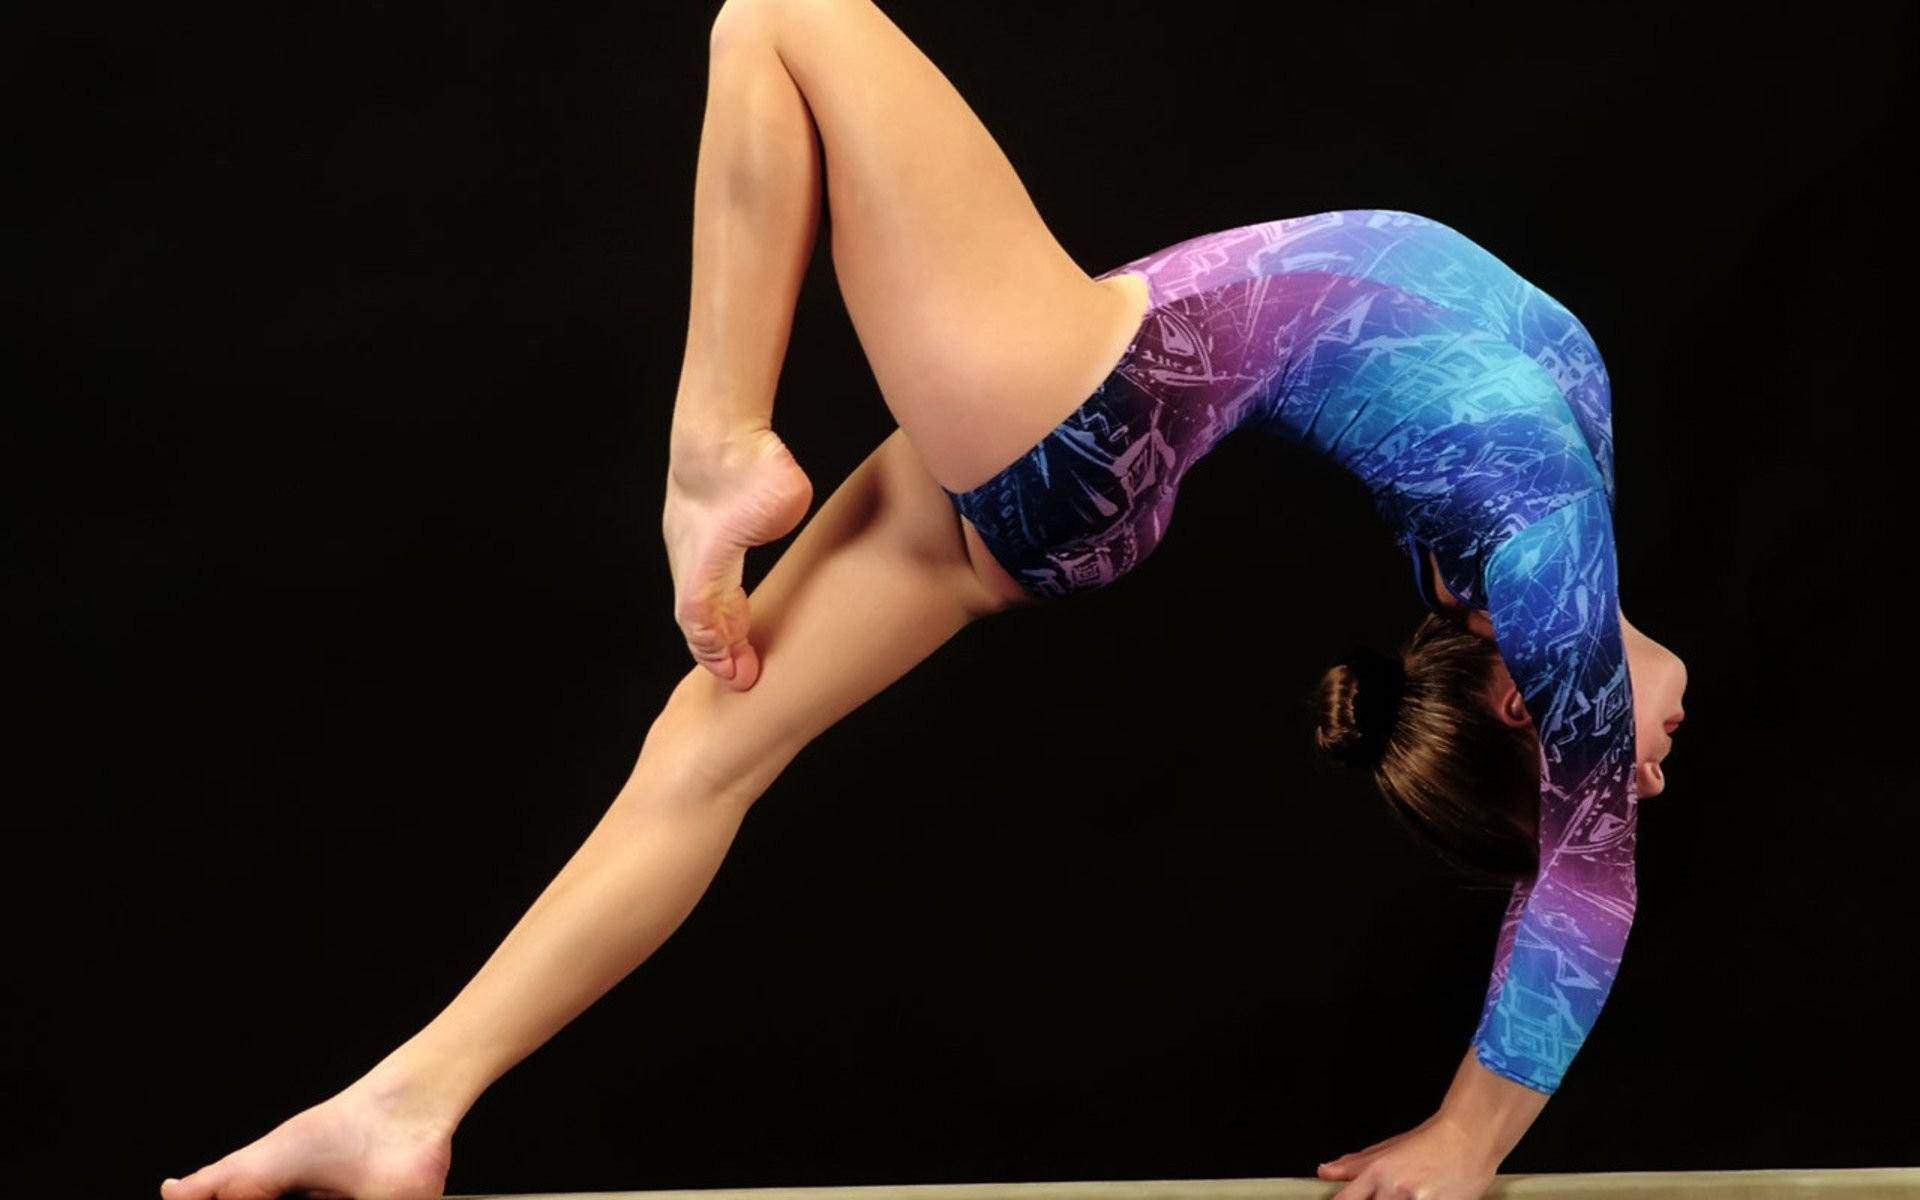 1920x1200 Wallpaperwiki Free Download Gymnastics Photo PIC WPE007390